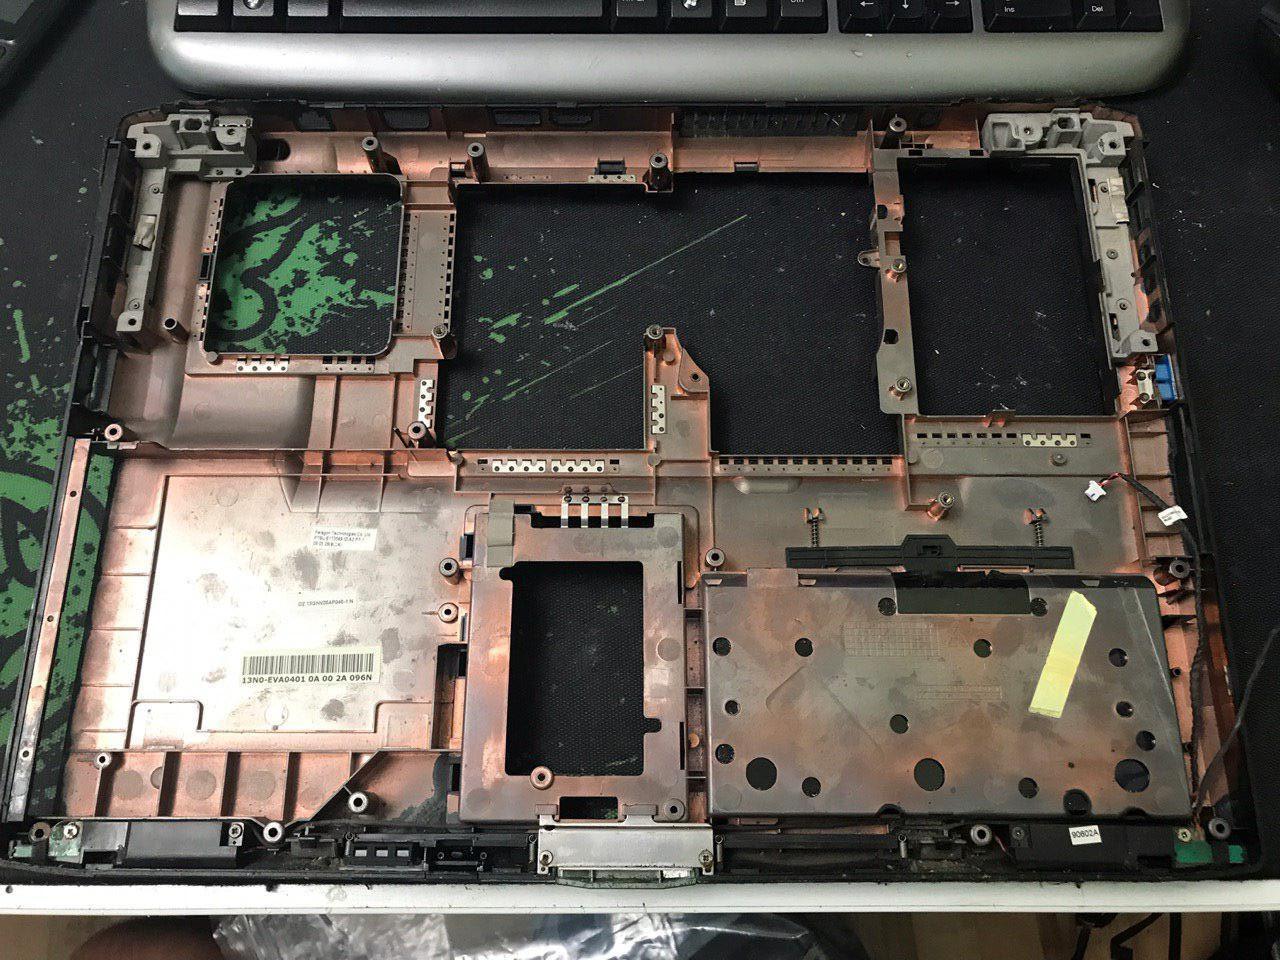 Нижнее корыта корпуса для ноутбука Asus Rog G71G